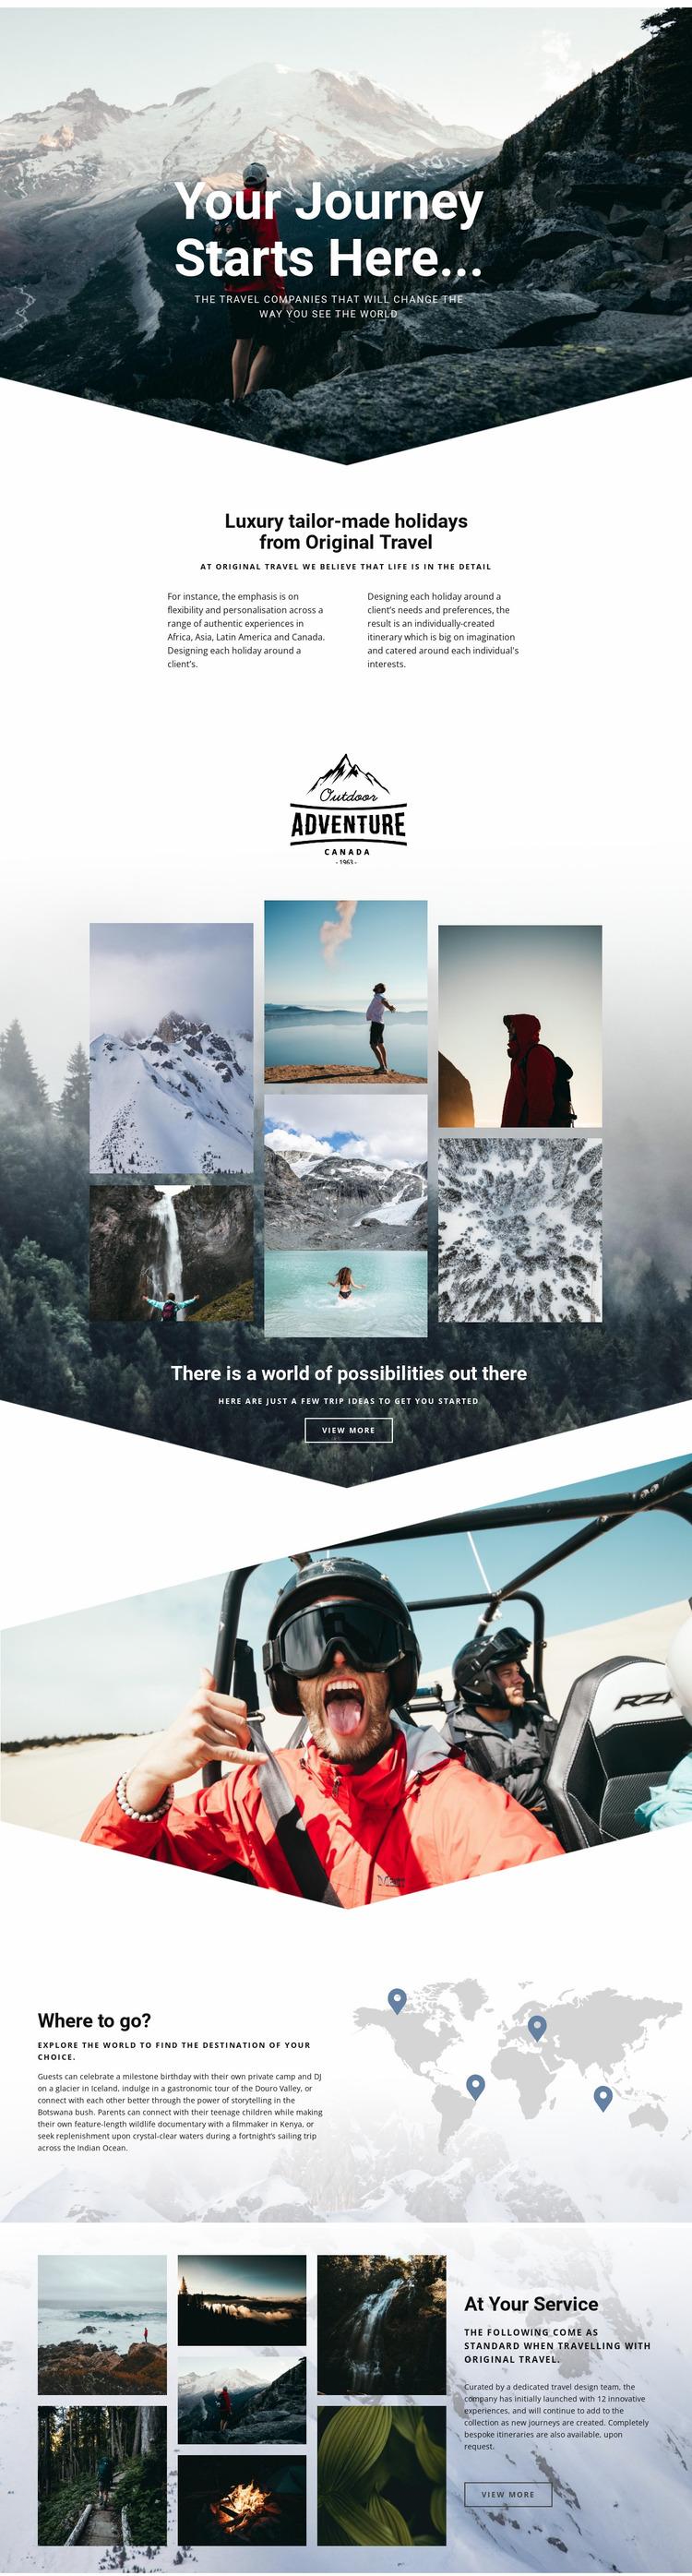 Original holiday travel Website Mockup